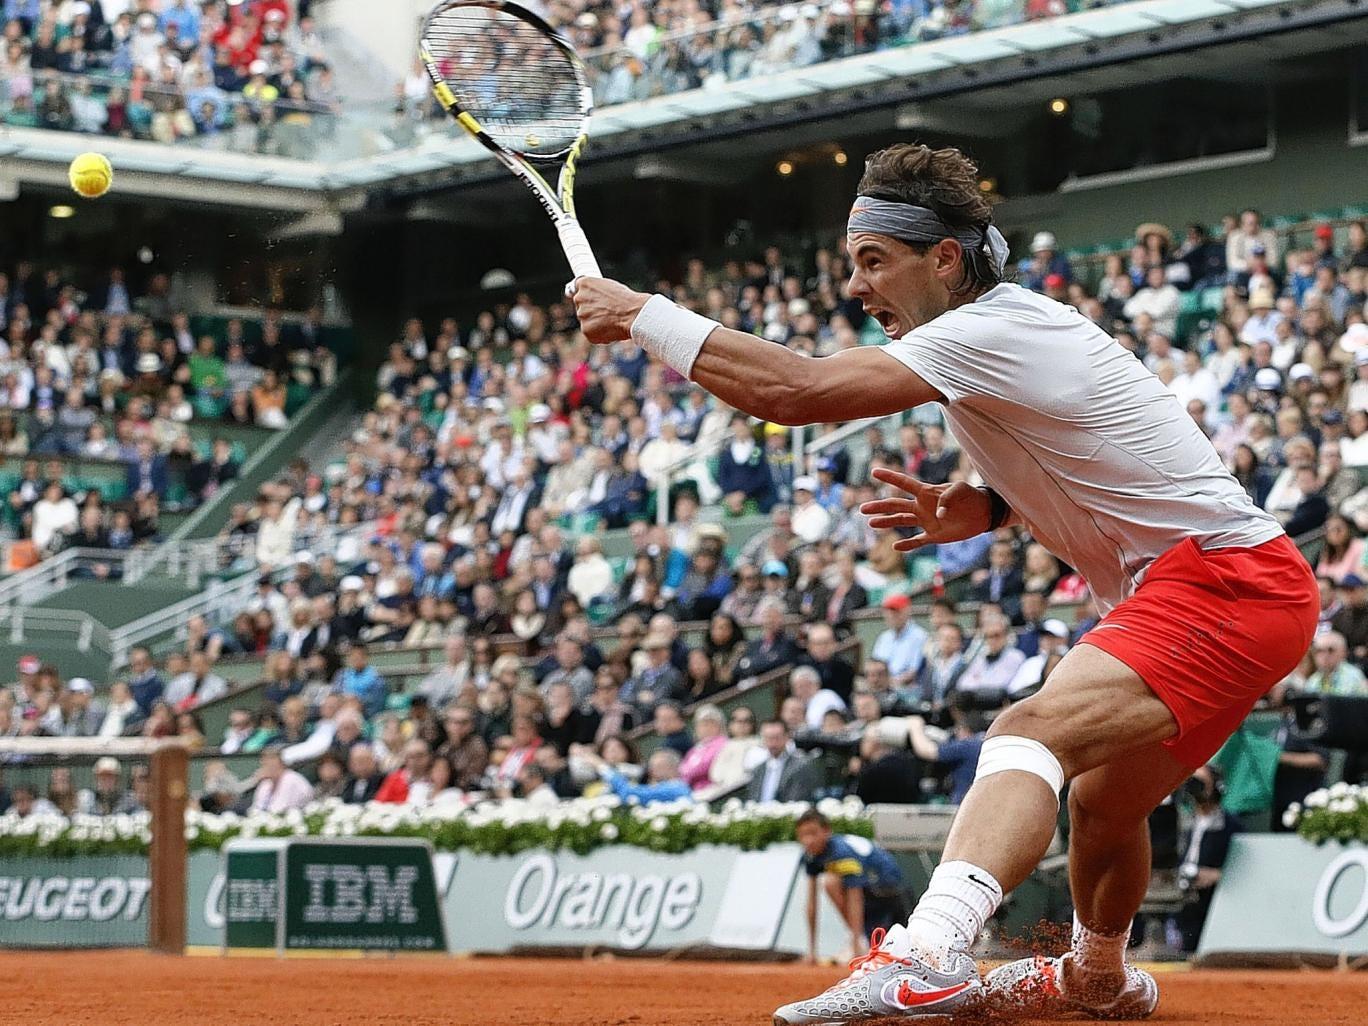 Rafael Nadal of Spain puts in a screaming return in his victory over the Italian Fabio Fognini